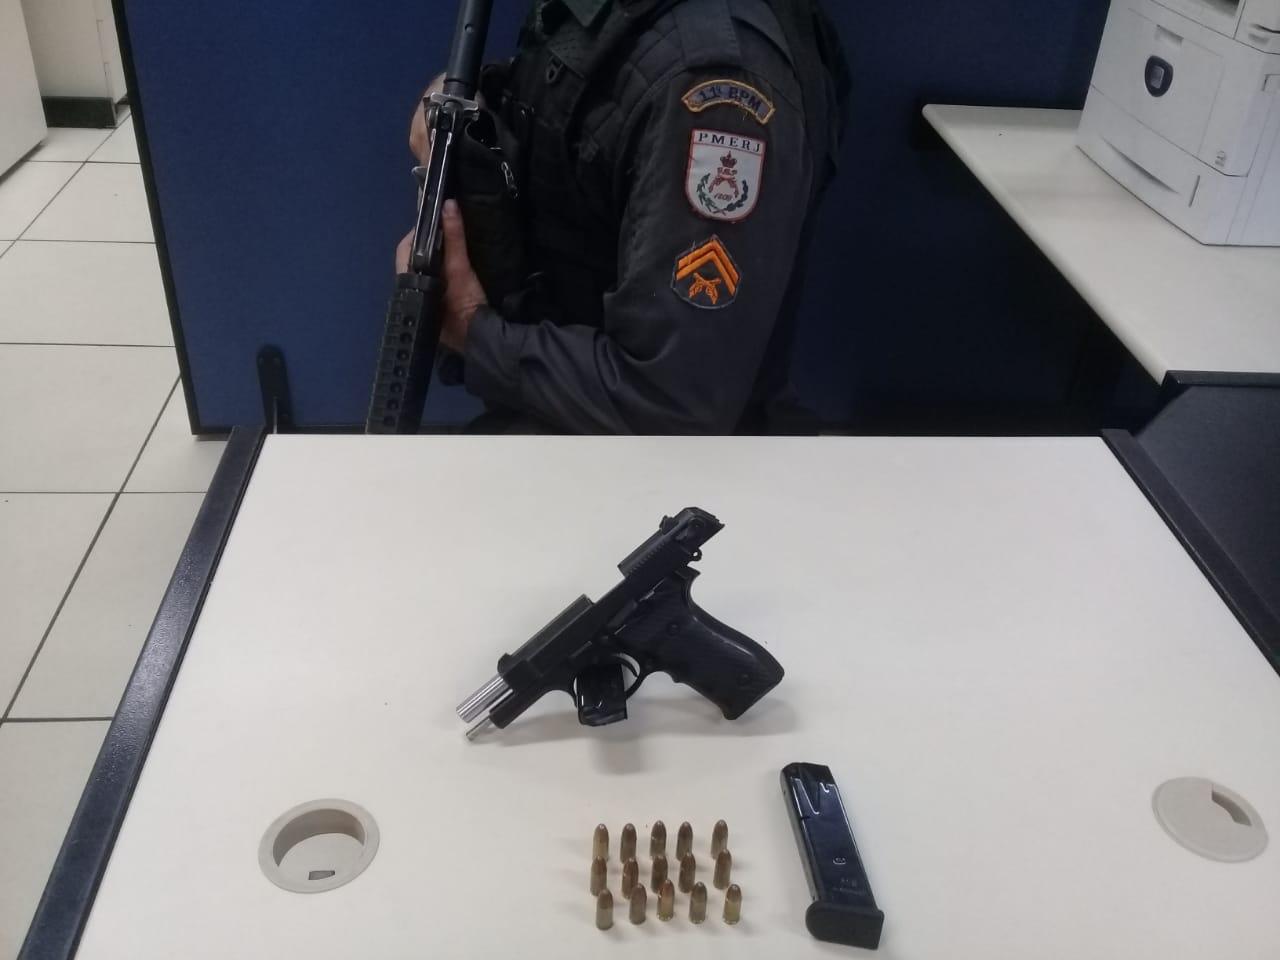 A arma  encontrada na mata (Foto: 11 BPM)